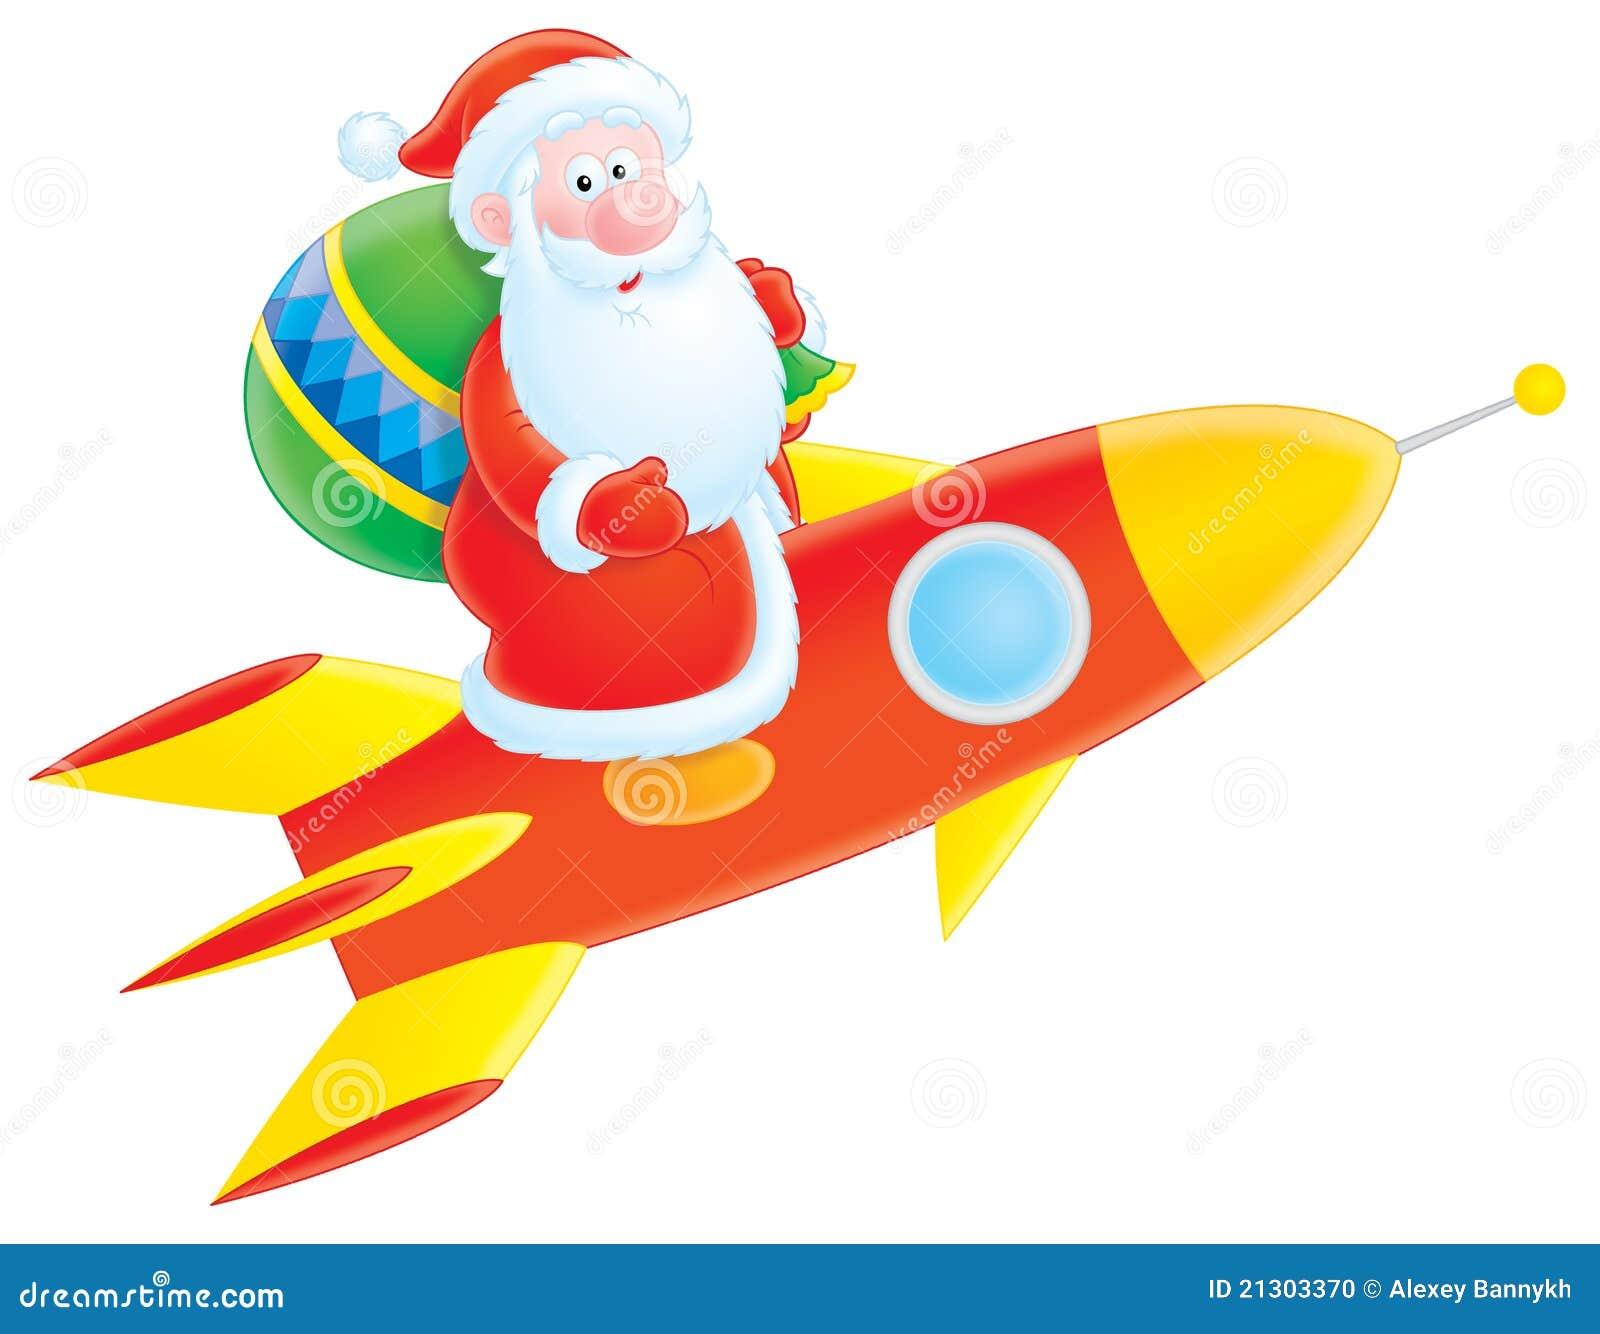 Santa Claus Flies On A Rocket Stock Photo - Image: 21303370